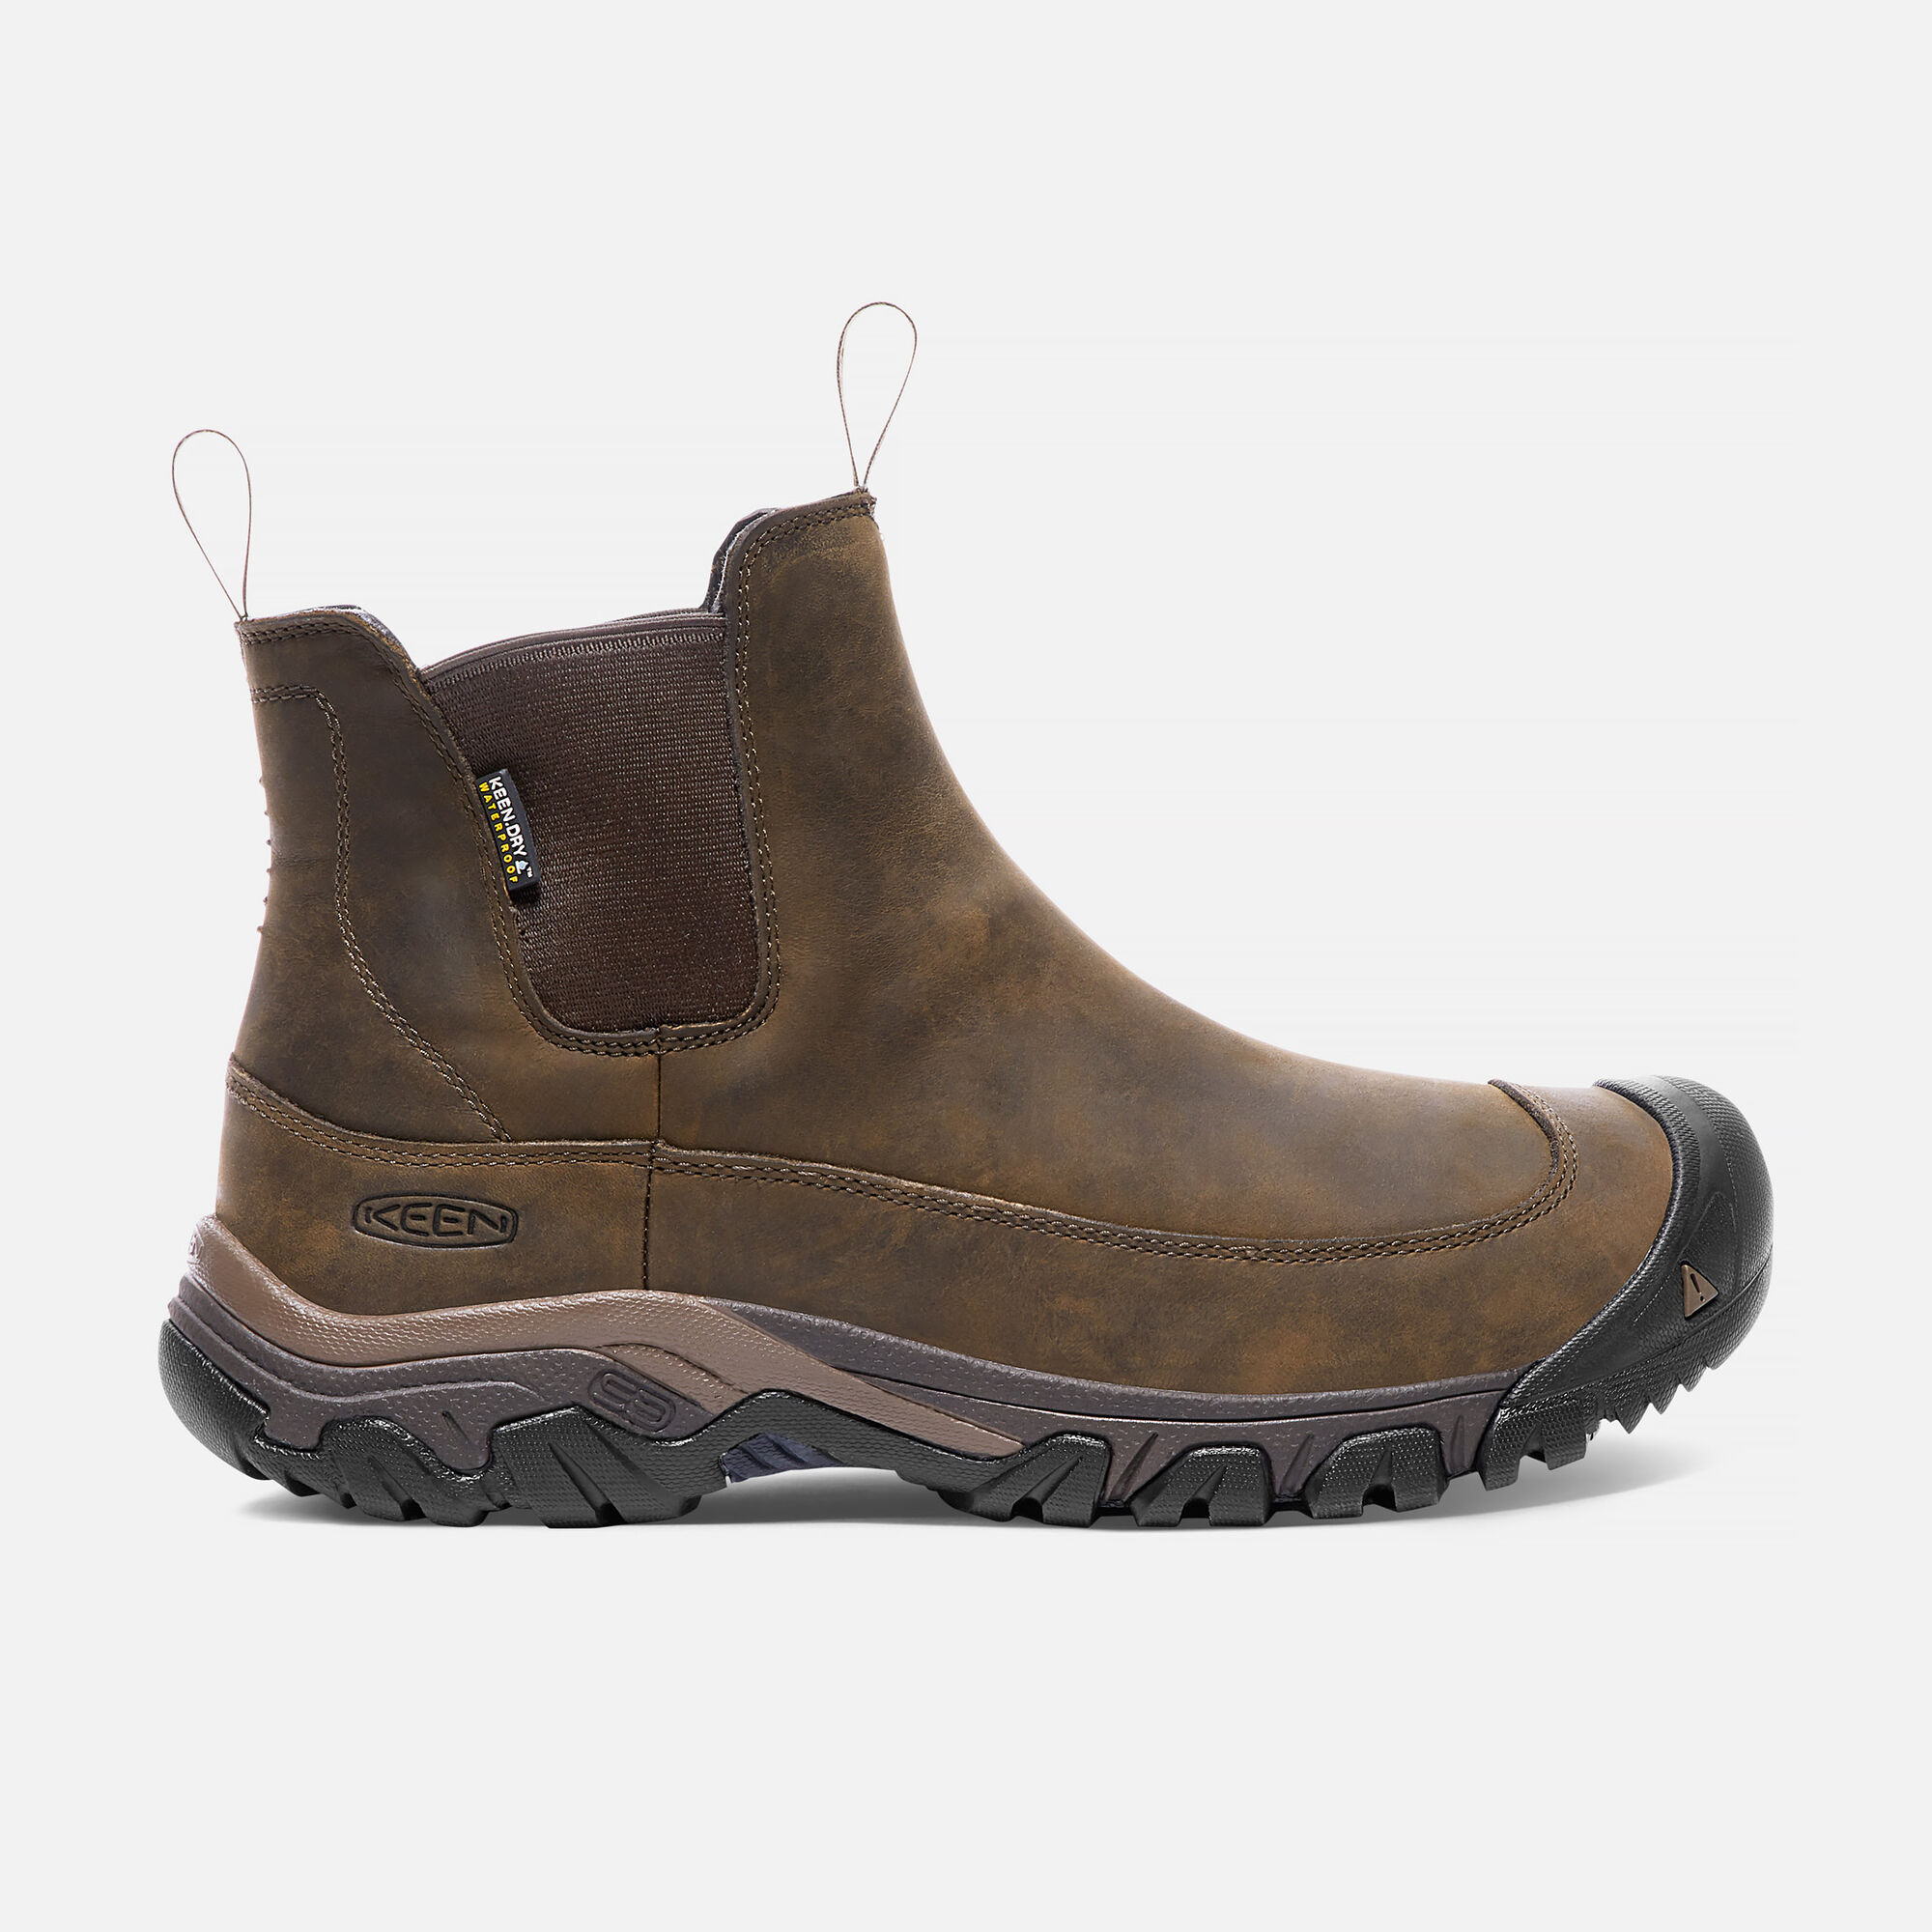 Anchorage III WP Boot - Men's